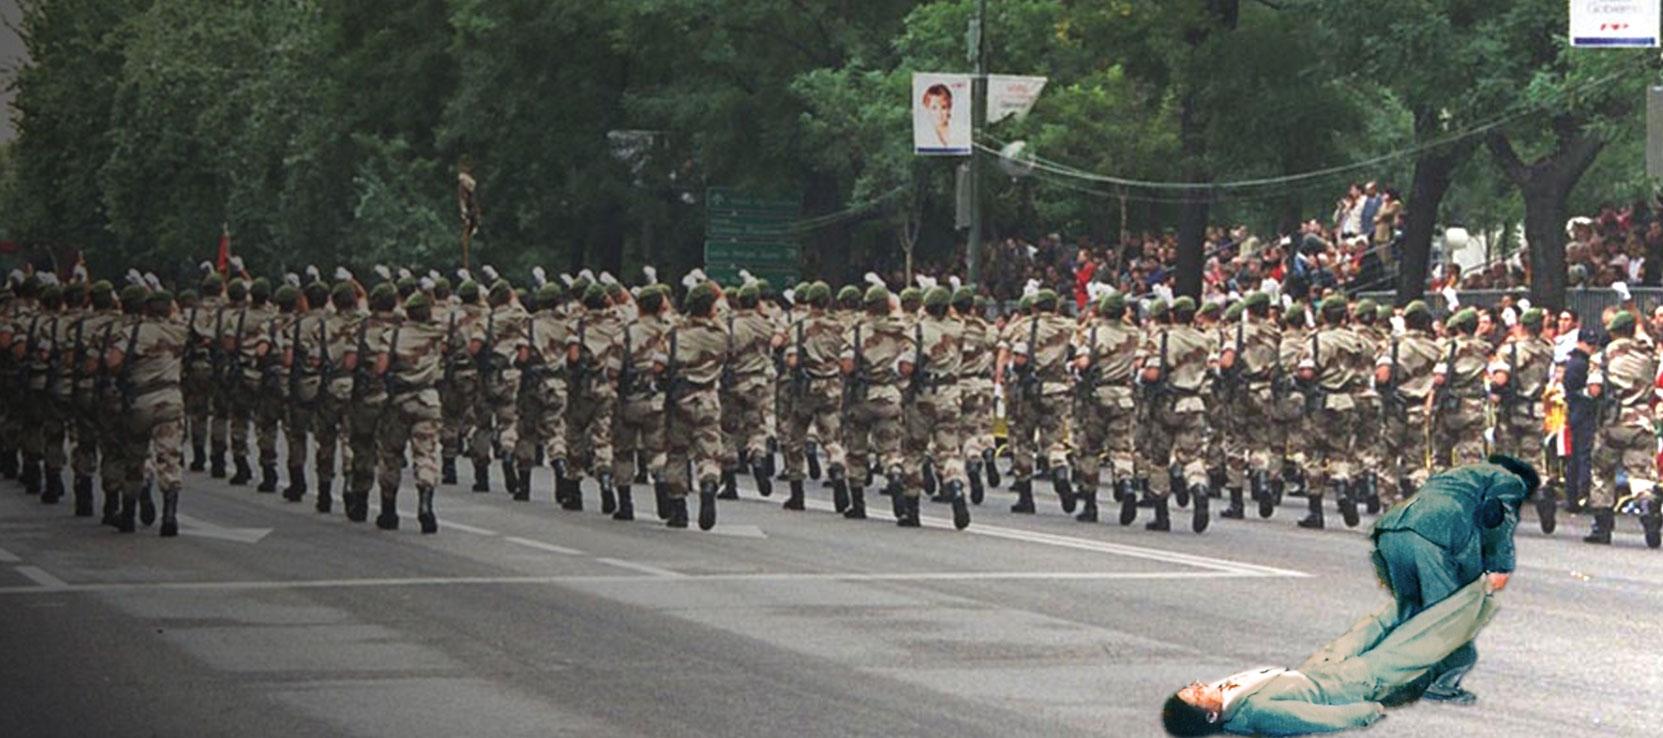 desfile-militar-web.jpg